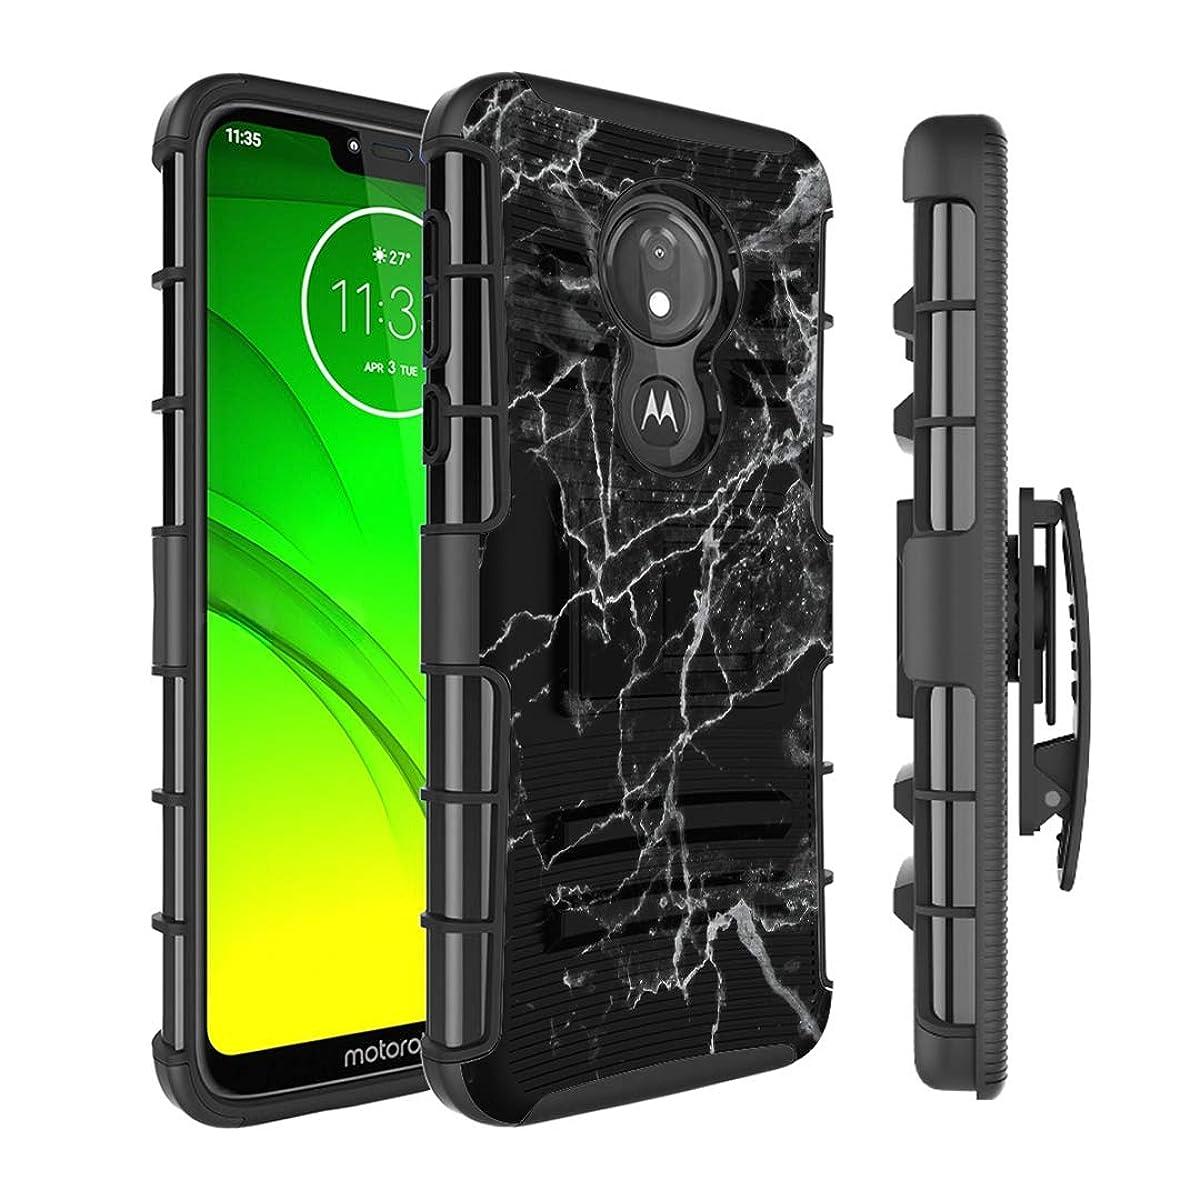 Moriko Case Compatible with Moto G7 Power, Moto G7 Supra [Kickstand Holster Combo Heavy Duty Protection Case Black] for Motorola Moto G7 Power - (Black Marble Print)